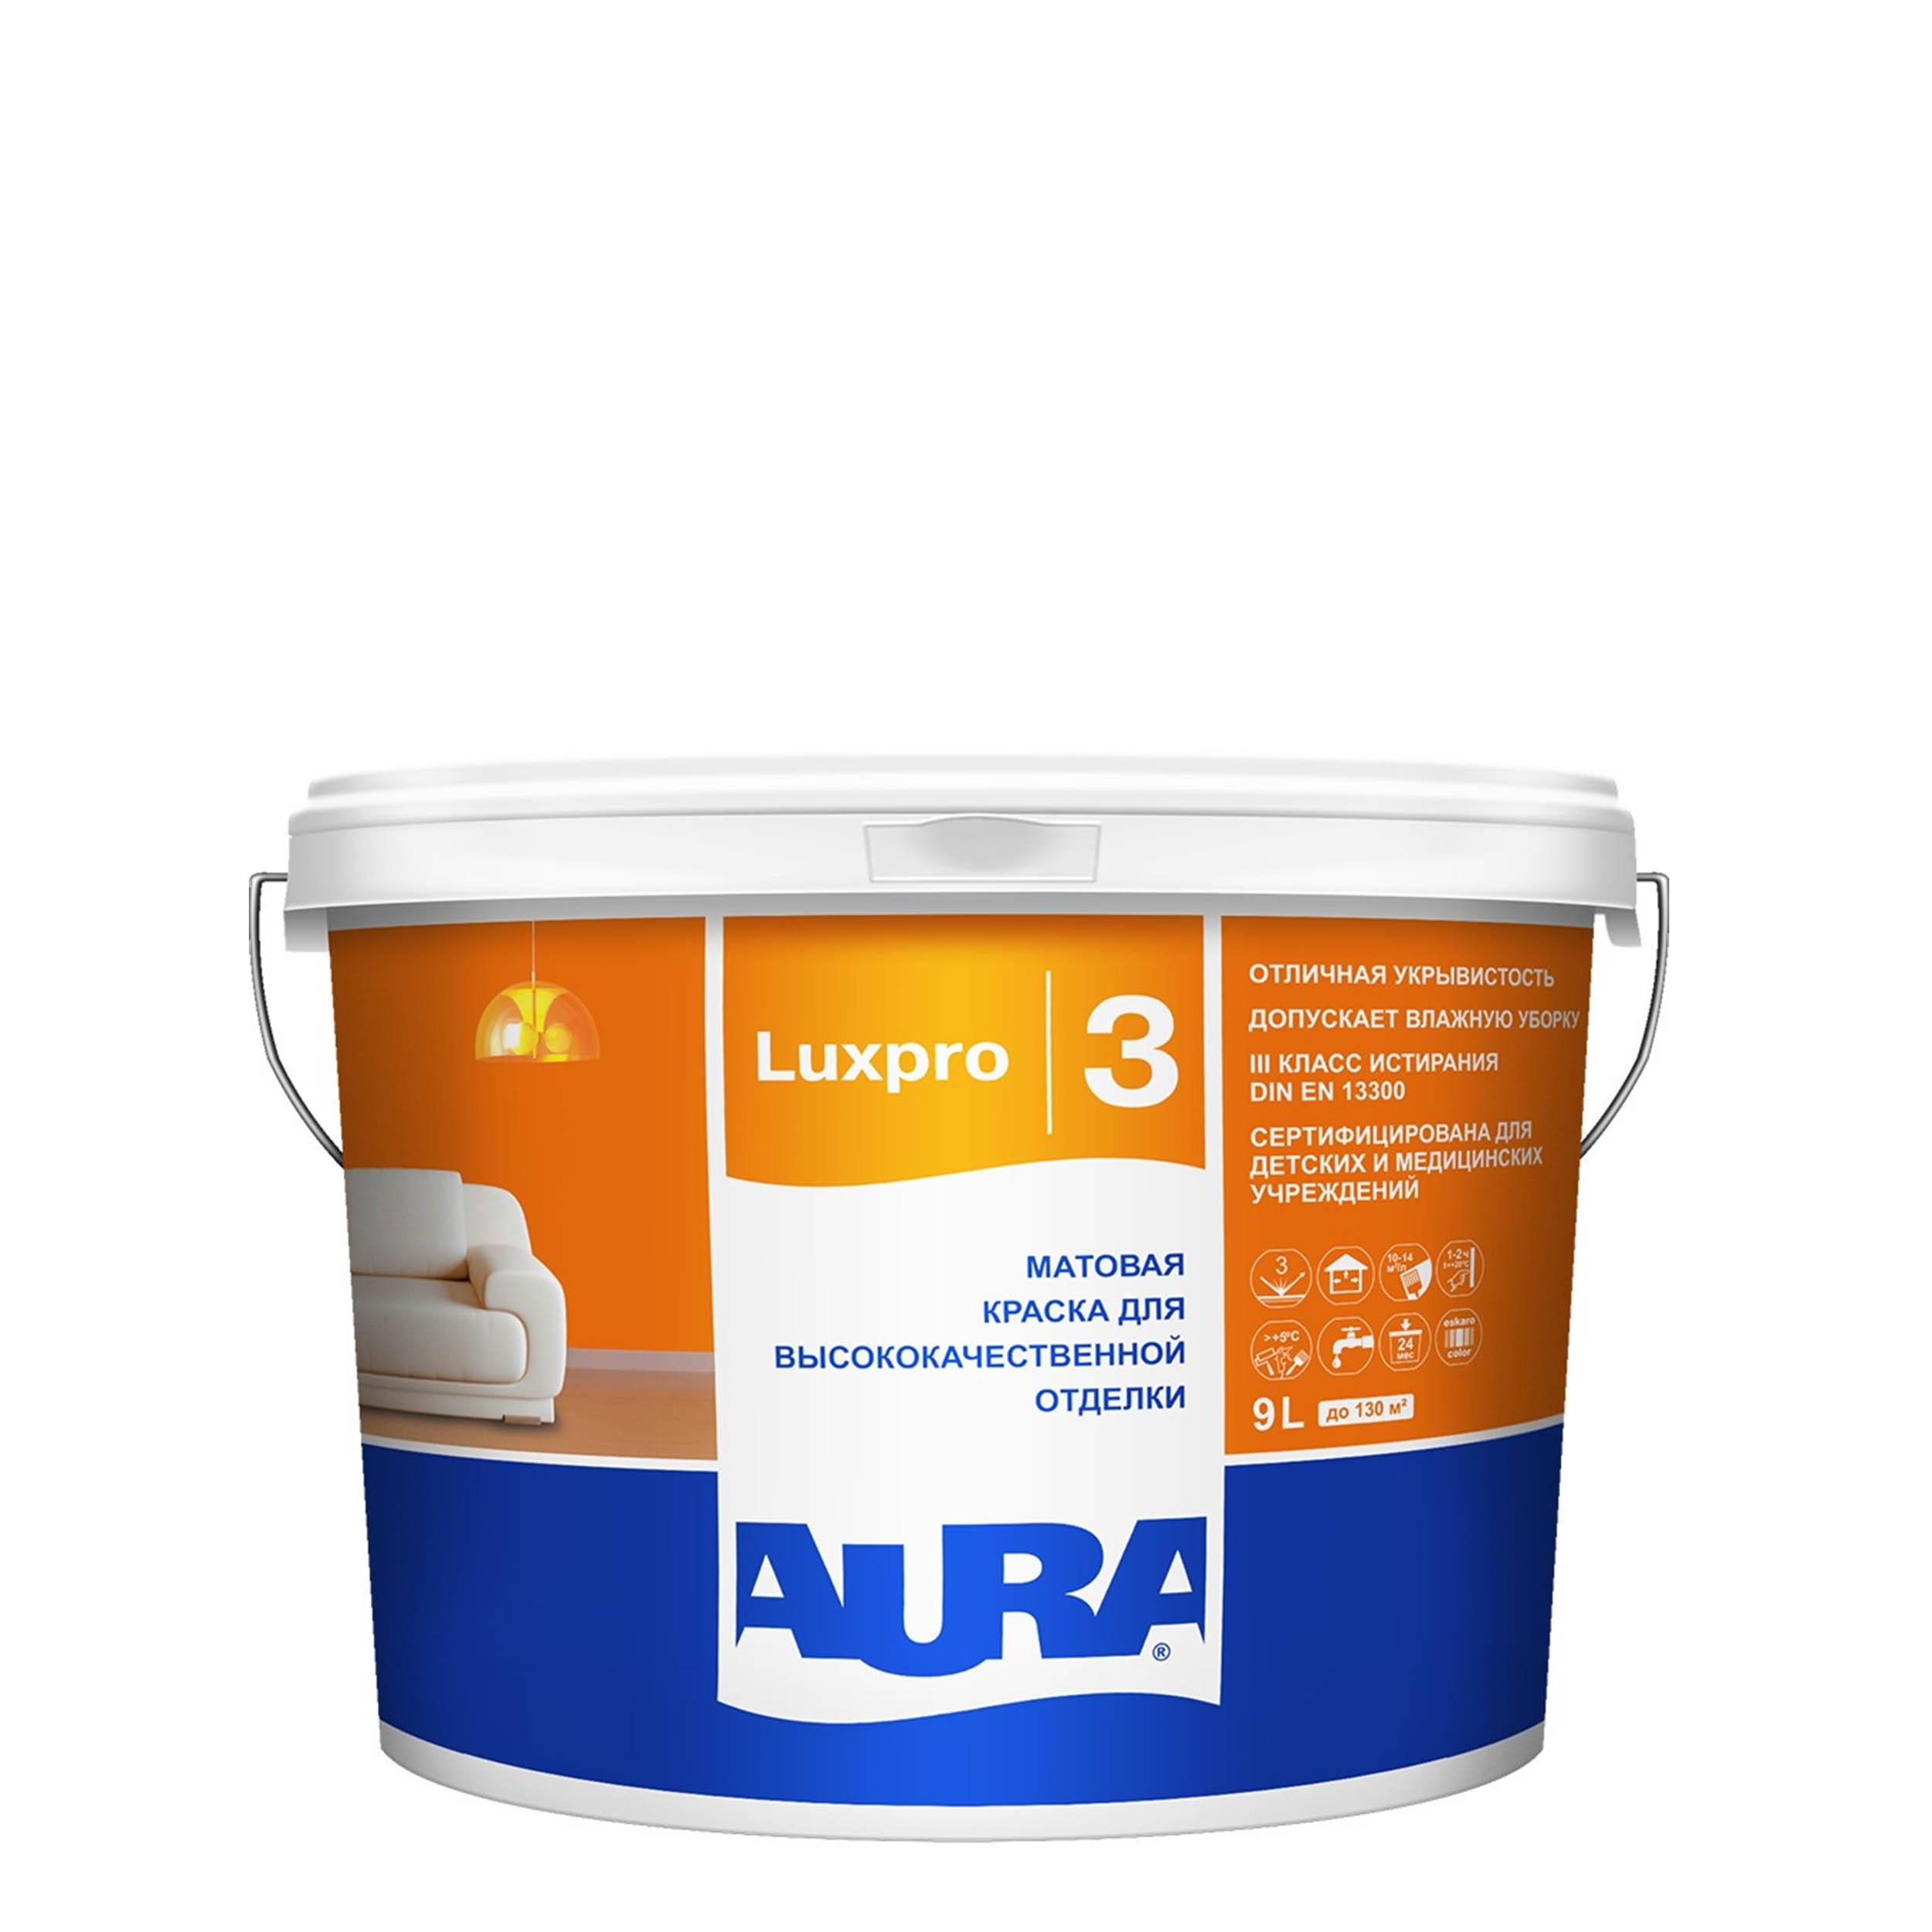 Фото 2 - Краска интерьерная, Aura LuxPRO 3, RAL 1001, 11 кг.